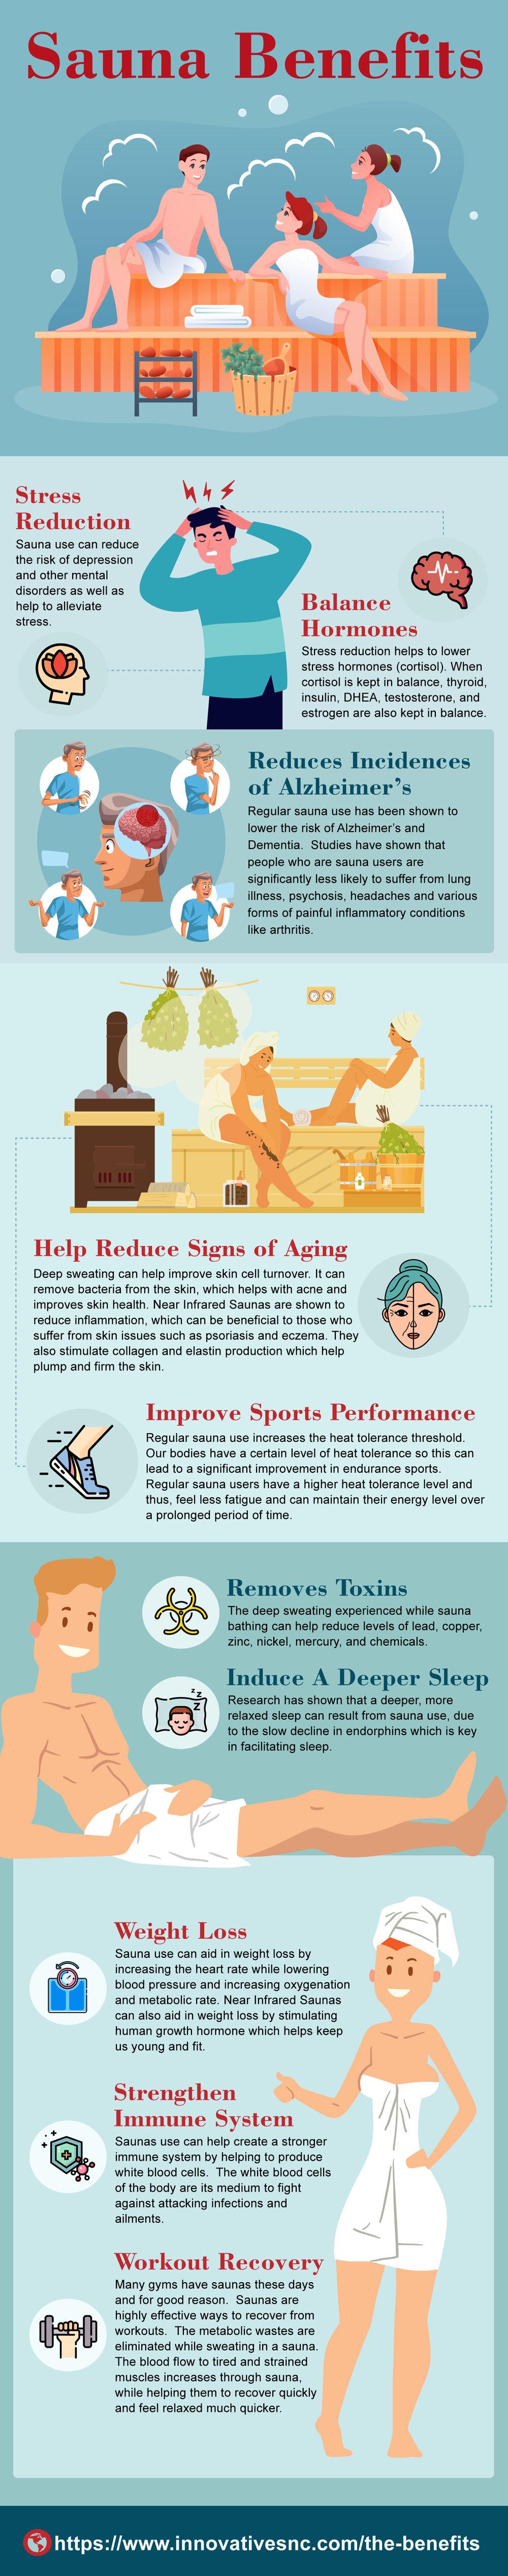 The Health Benefits of a Sauna